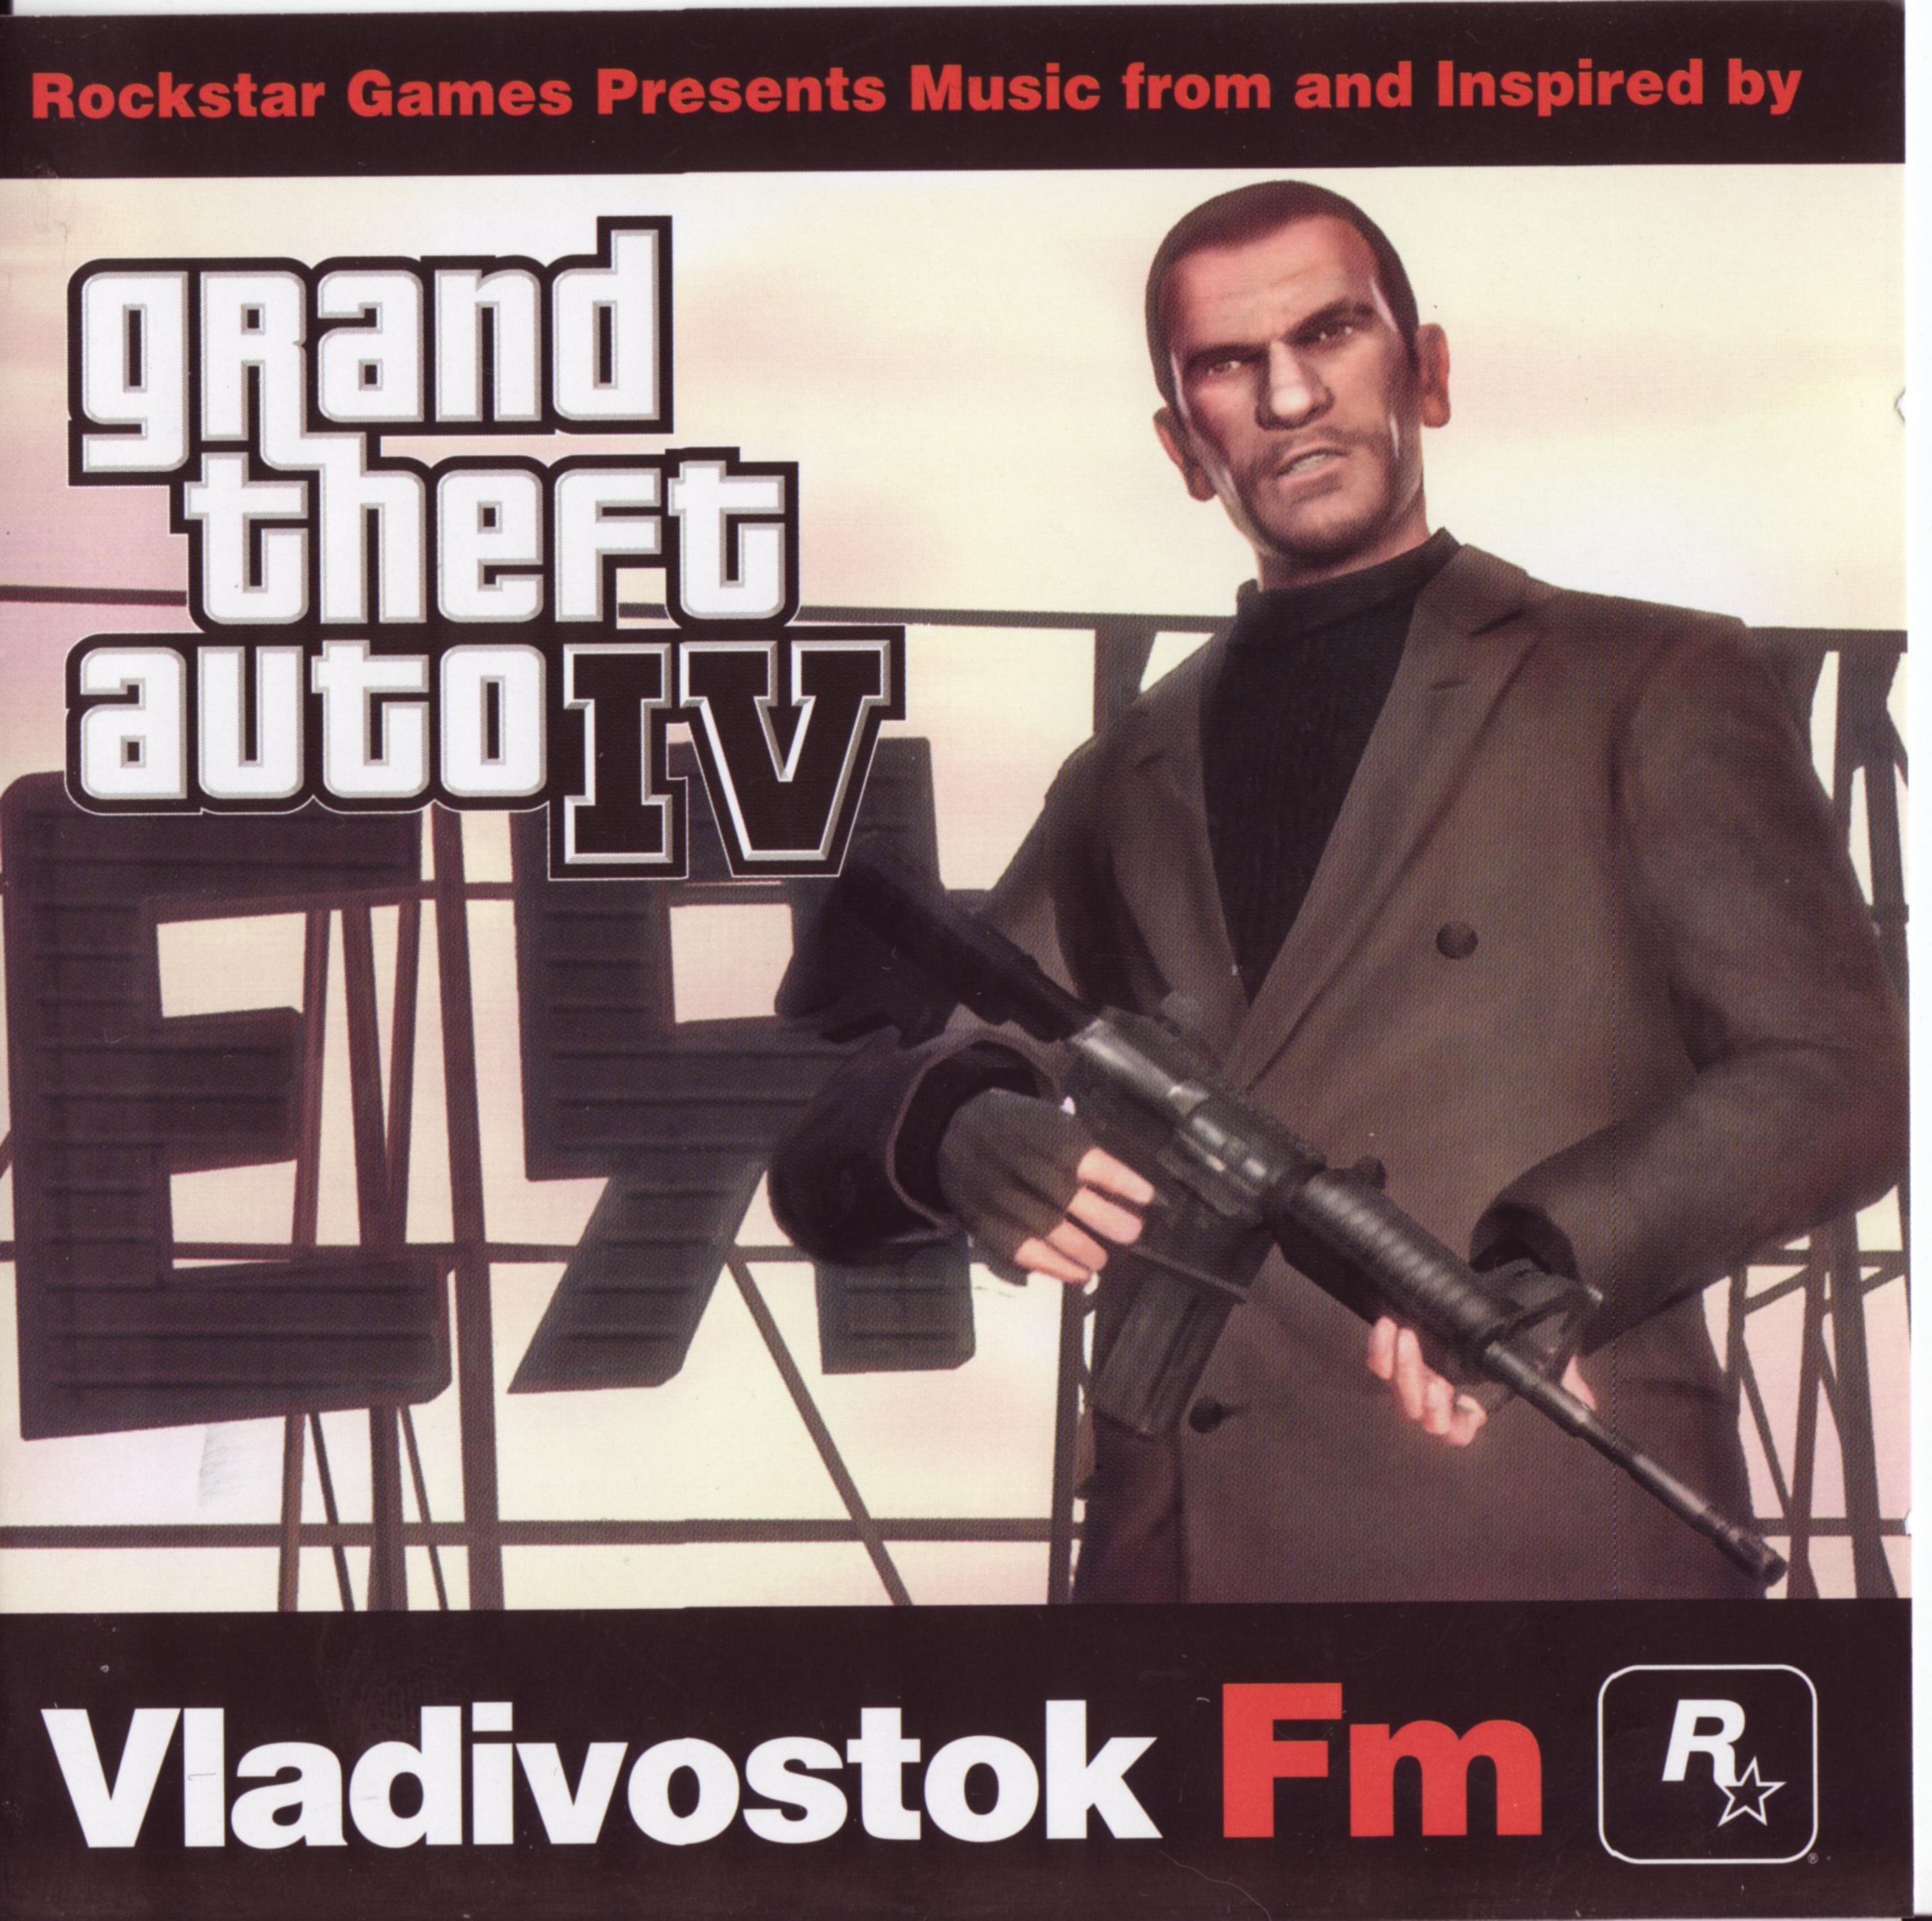 Grand Theft Auto IV: Vladivostok FM  Soundtrack from Grand